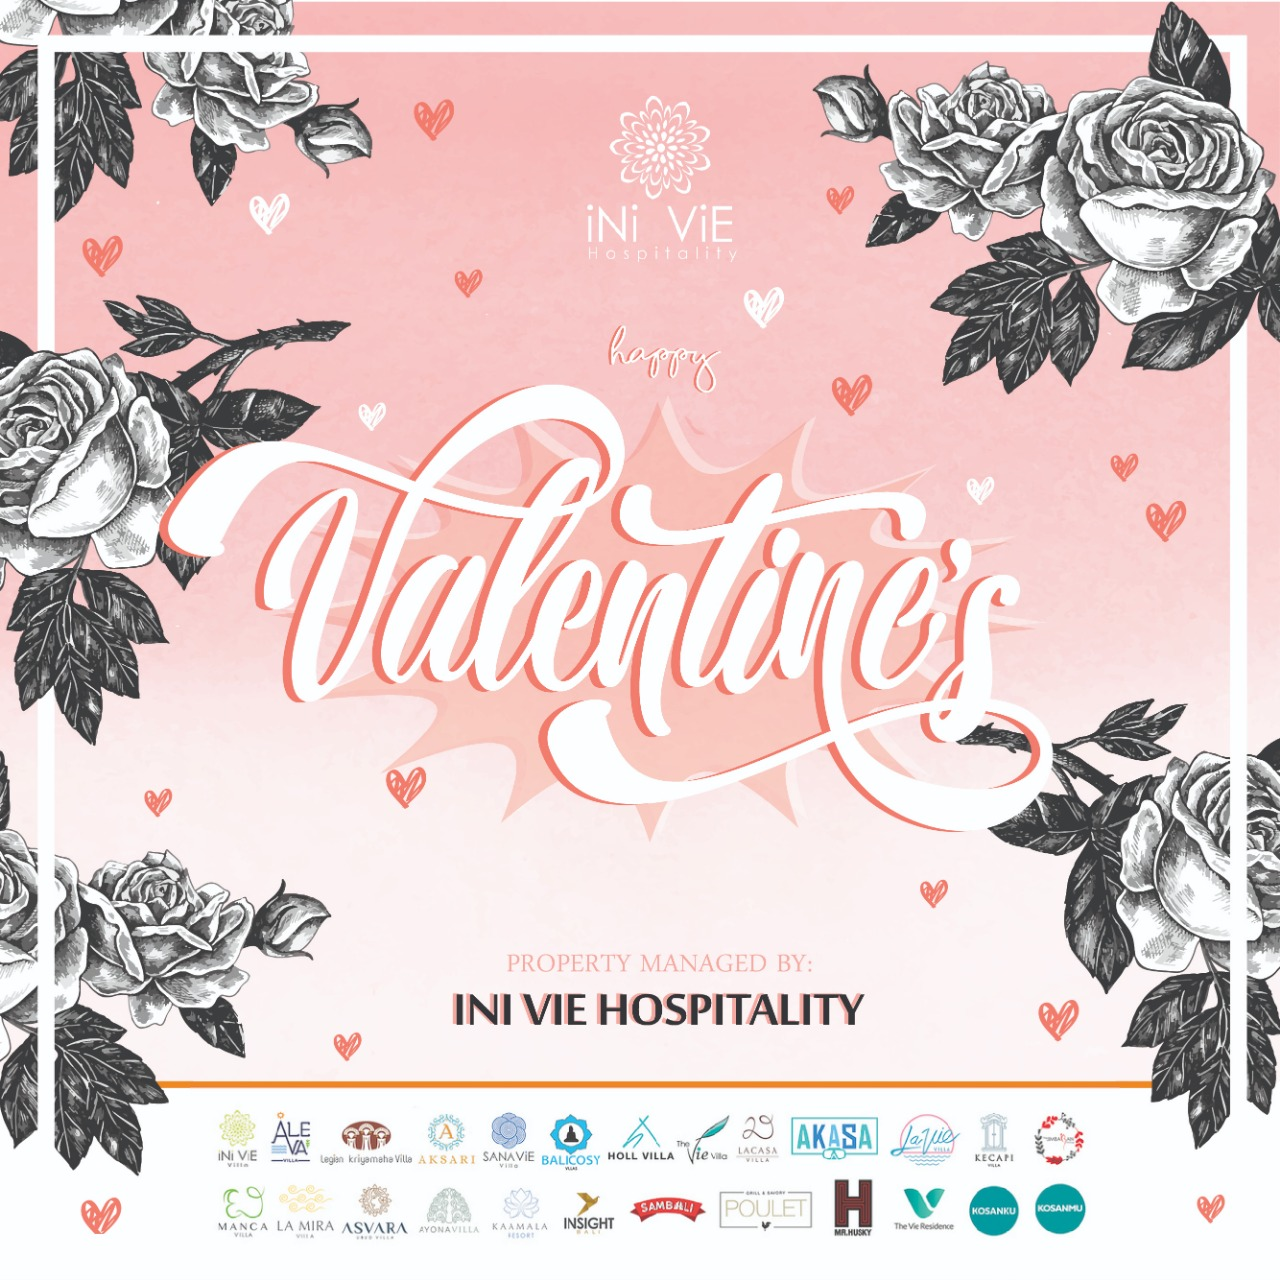 Happy Valentine's Day from Ini Vie Hospitality - Press Ini Vie Hospitality